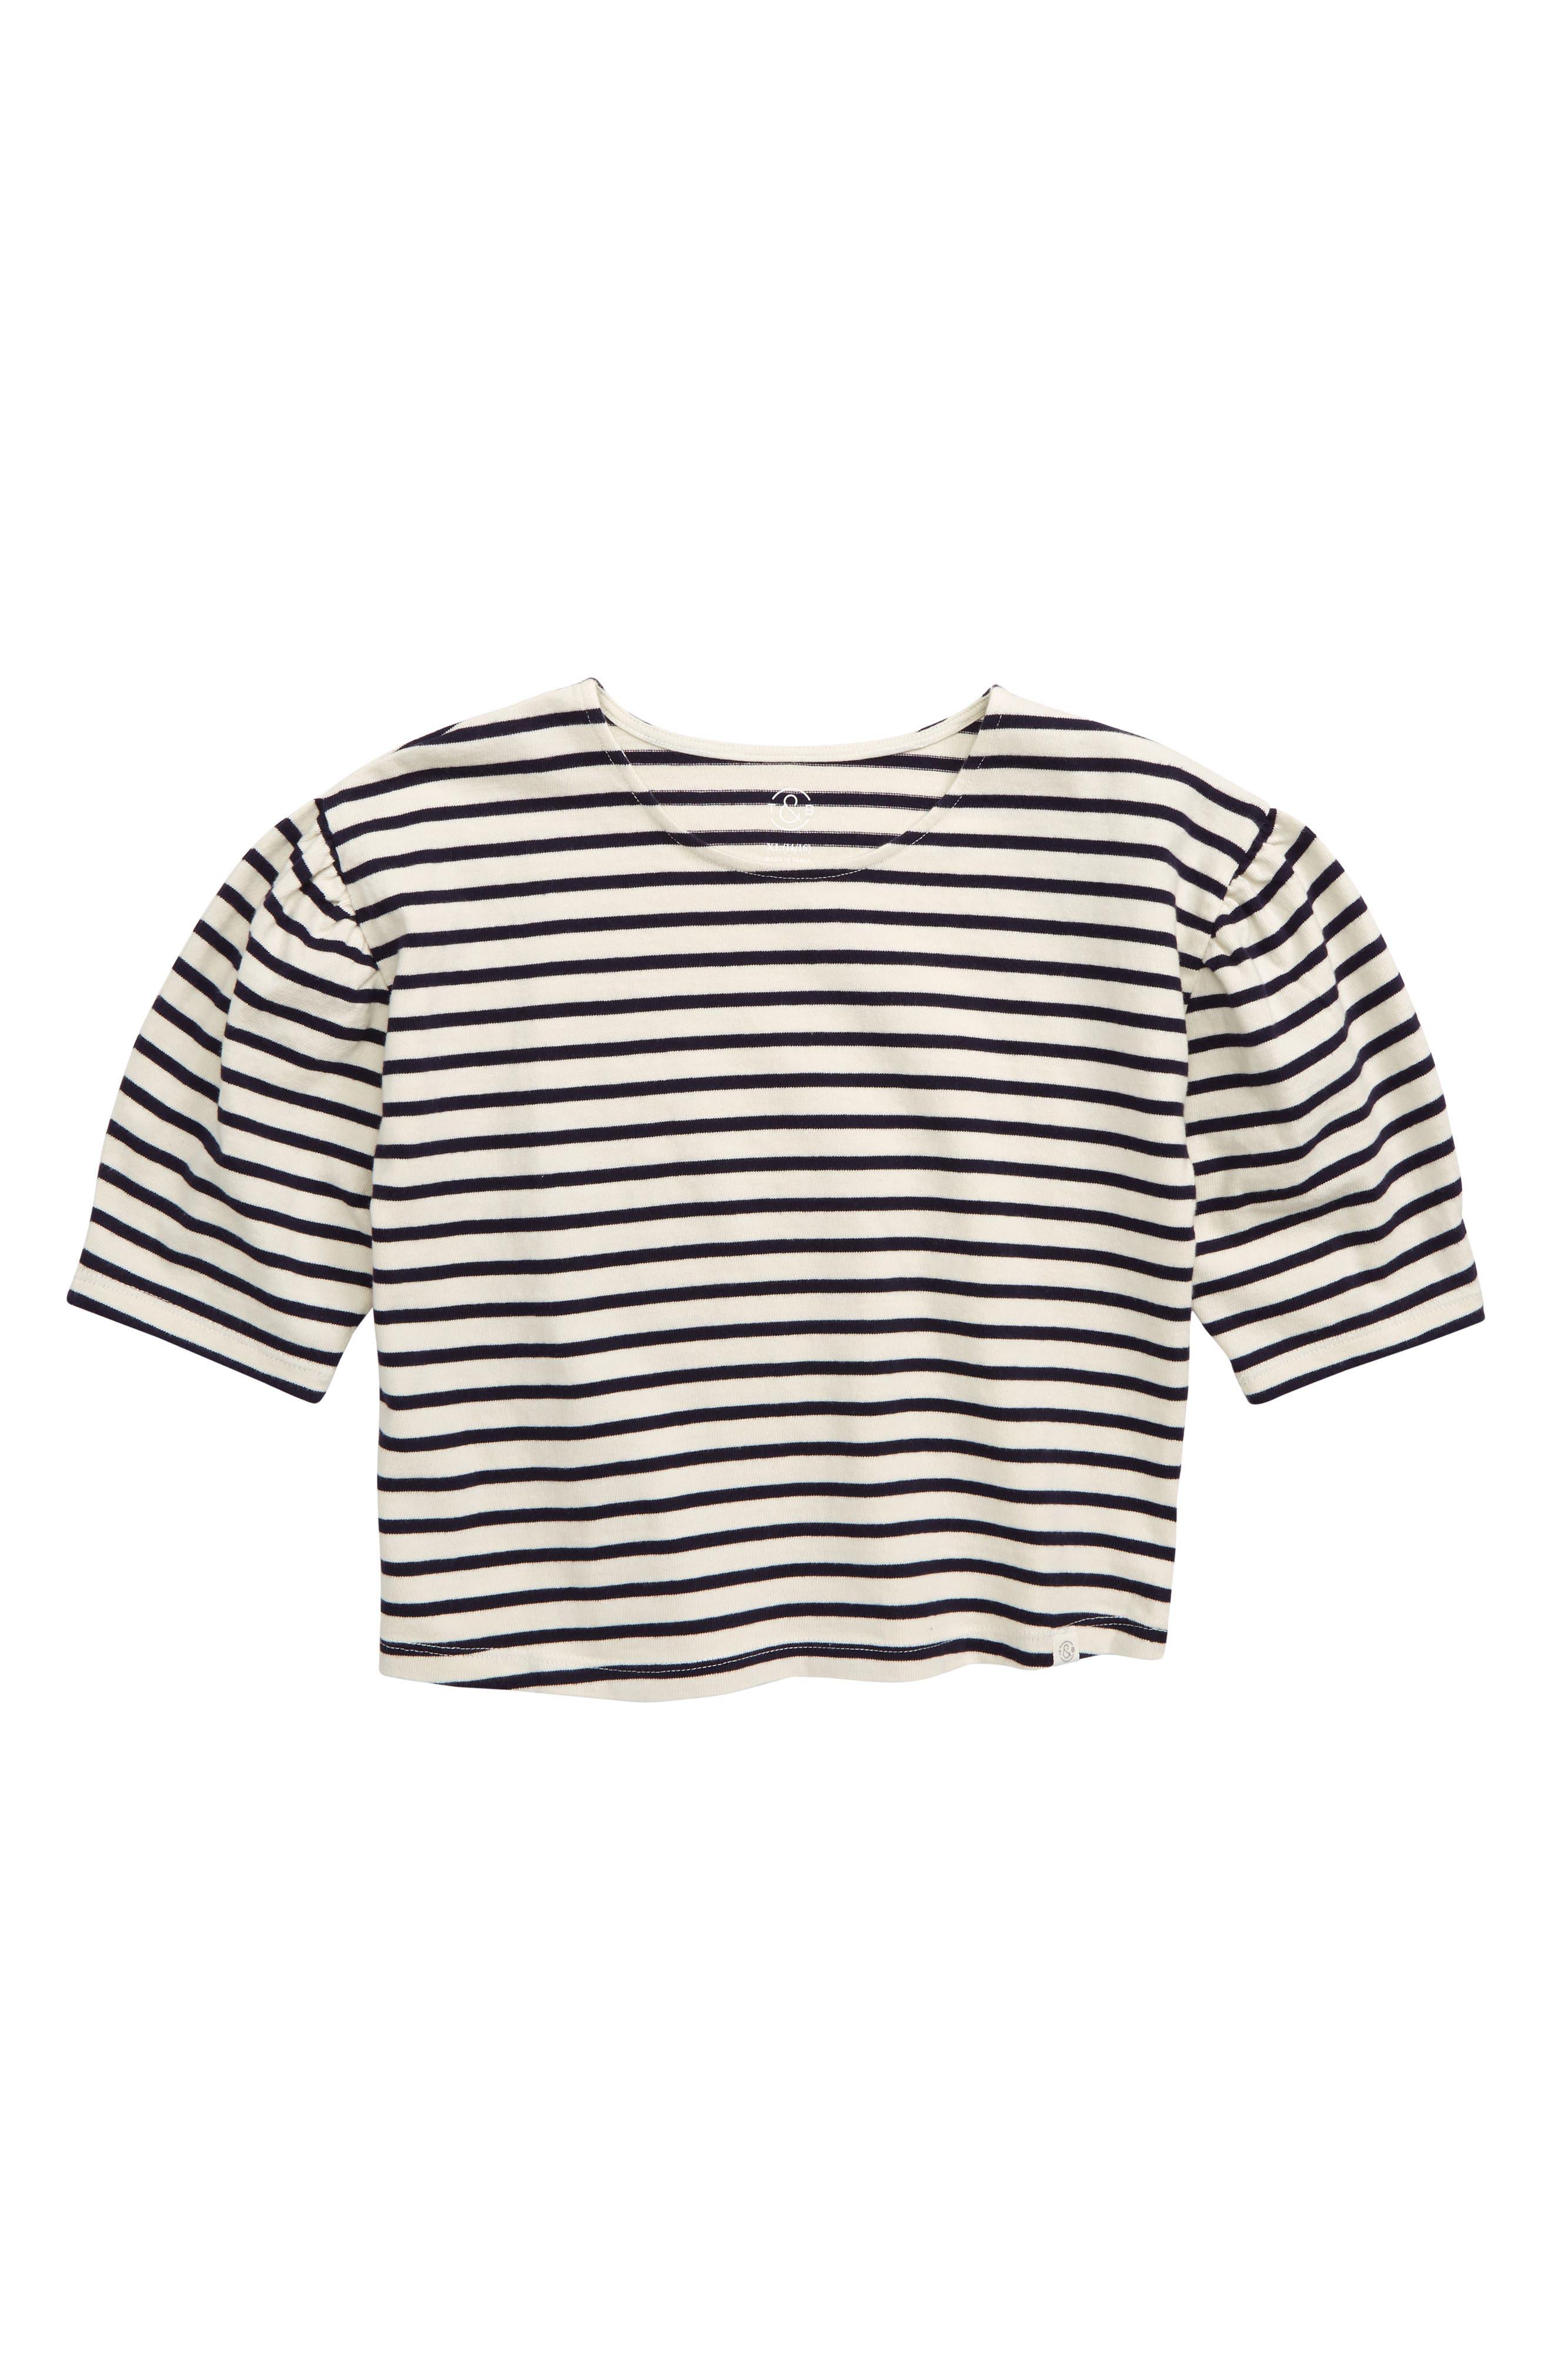 TREASURE & BOND Puff Sleeve Top, Main, color, IVORY ANTIQUE- NAVY BRETON